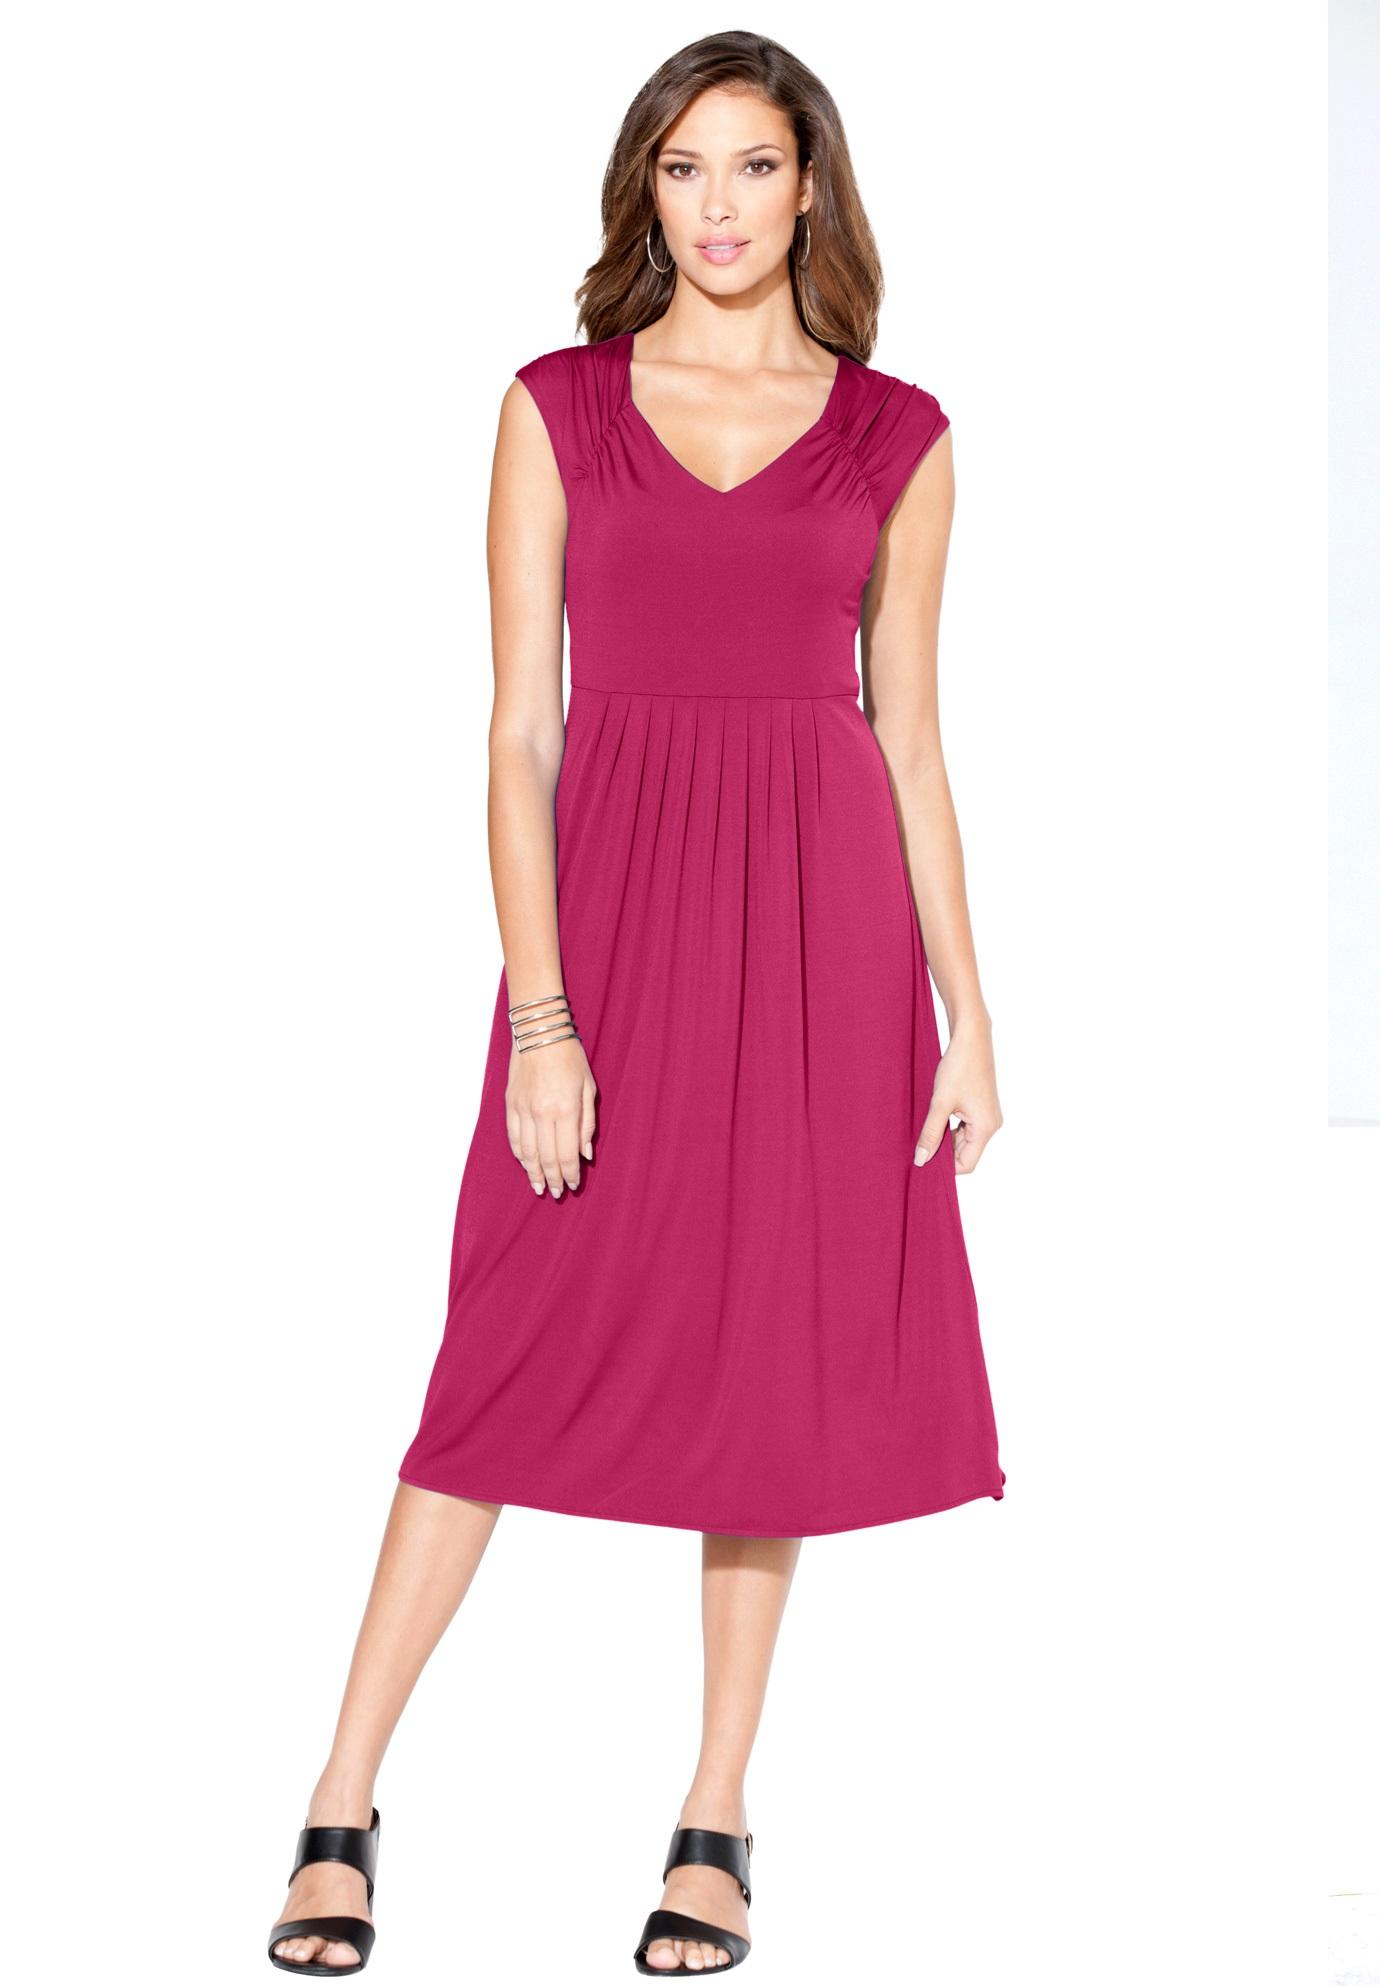 Fit And Flare Dress Plus Size Dresses Roamans